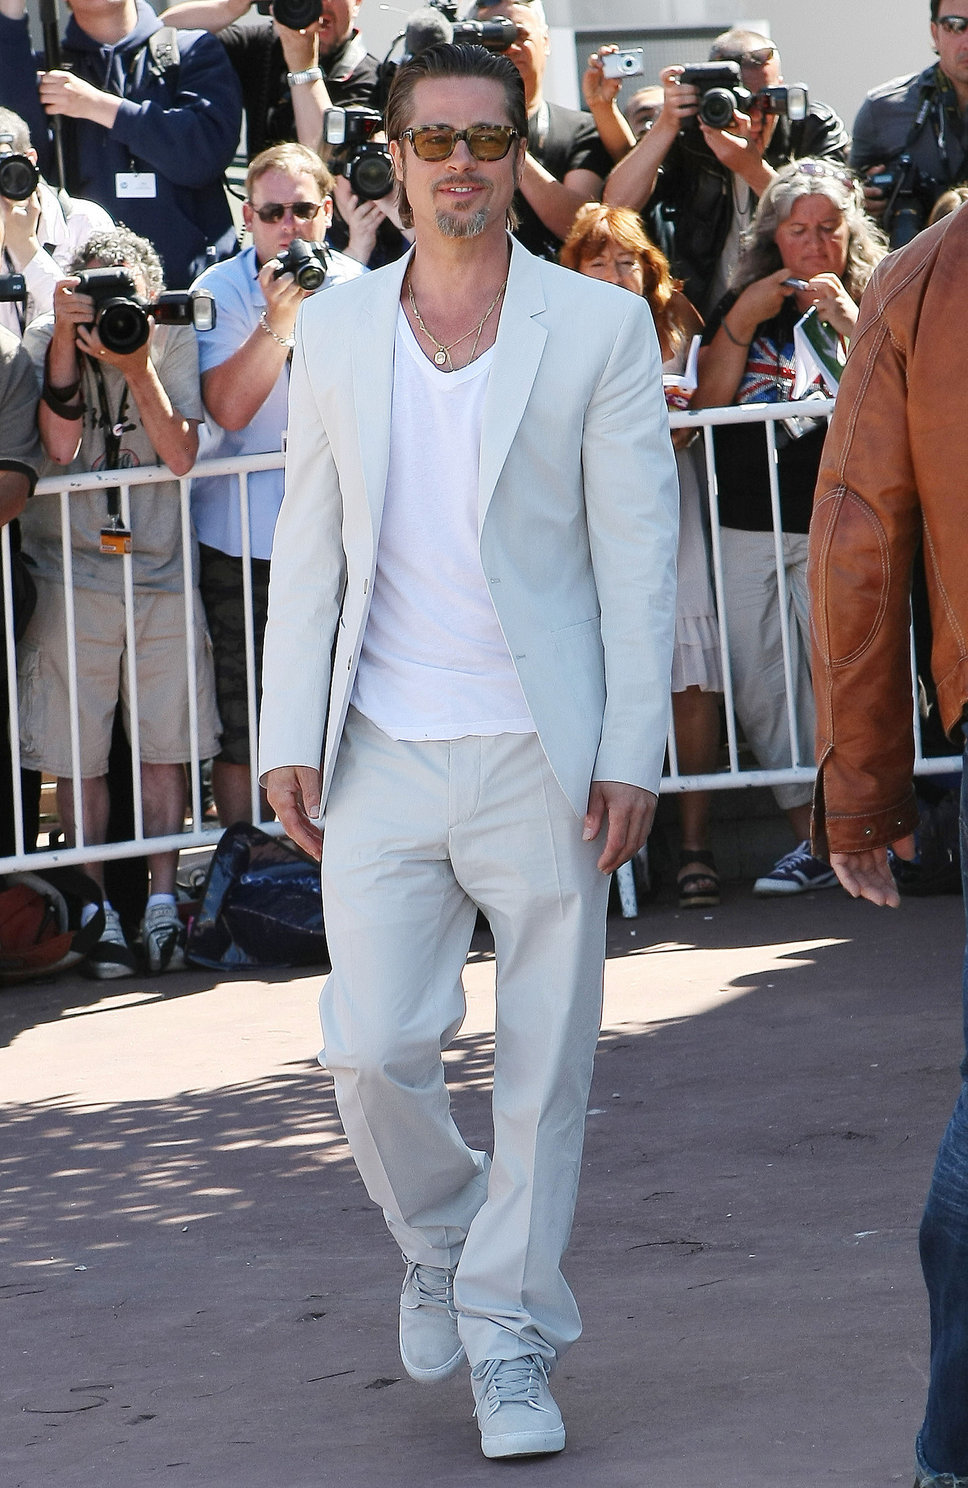 brad_pitt_white_sneakers_light_blue_grey_white_suit_t_shirt_sunglasses